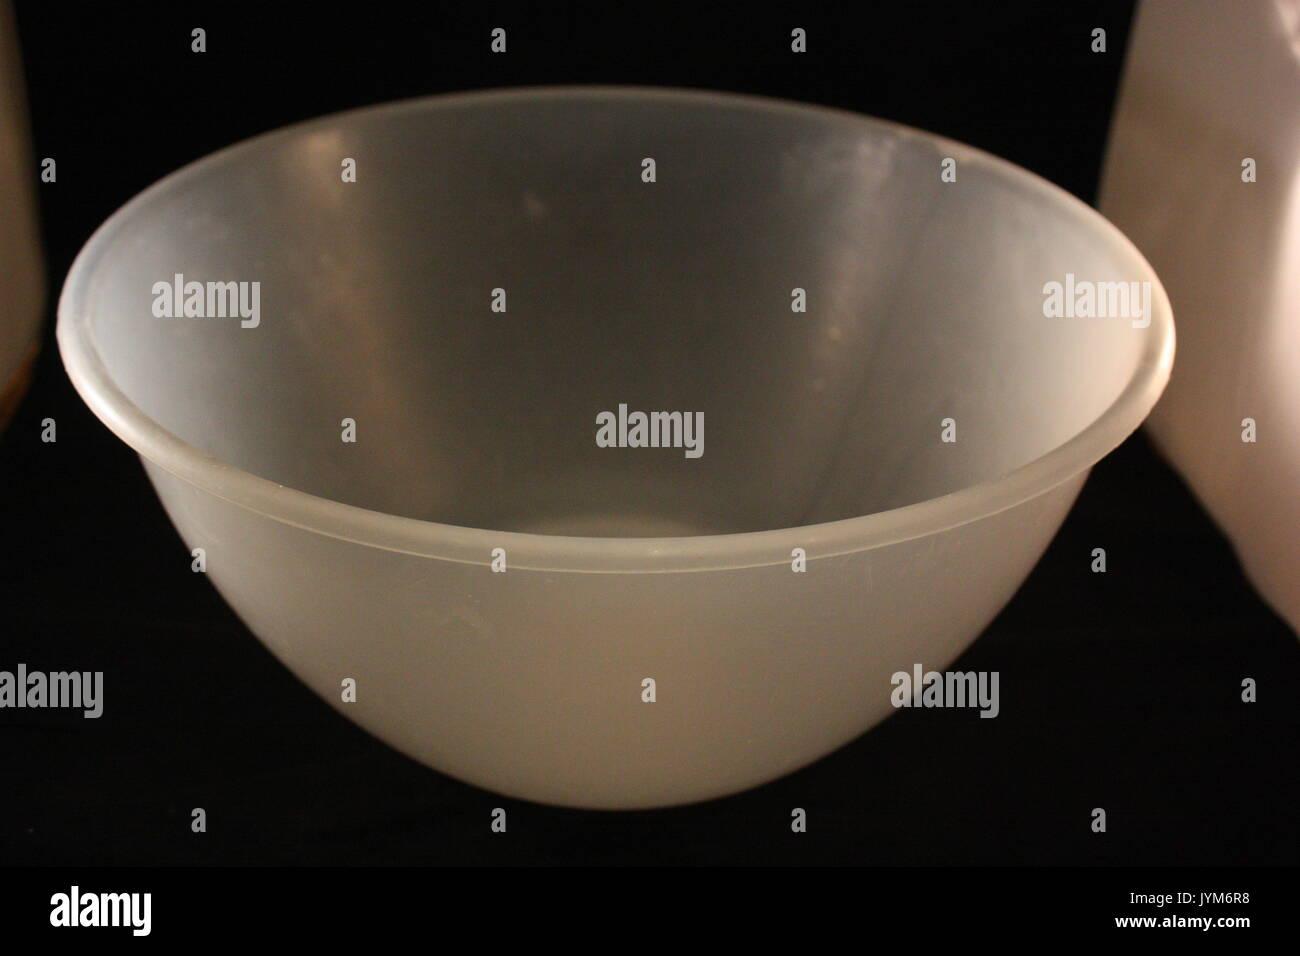 large plastic bowl - Stock Image